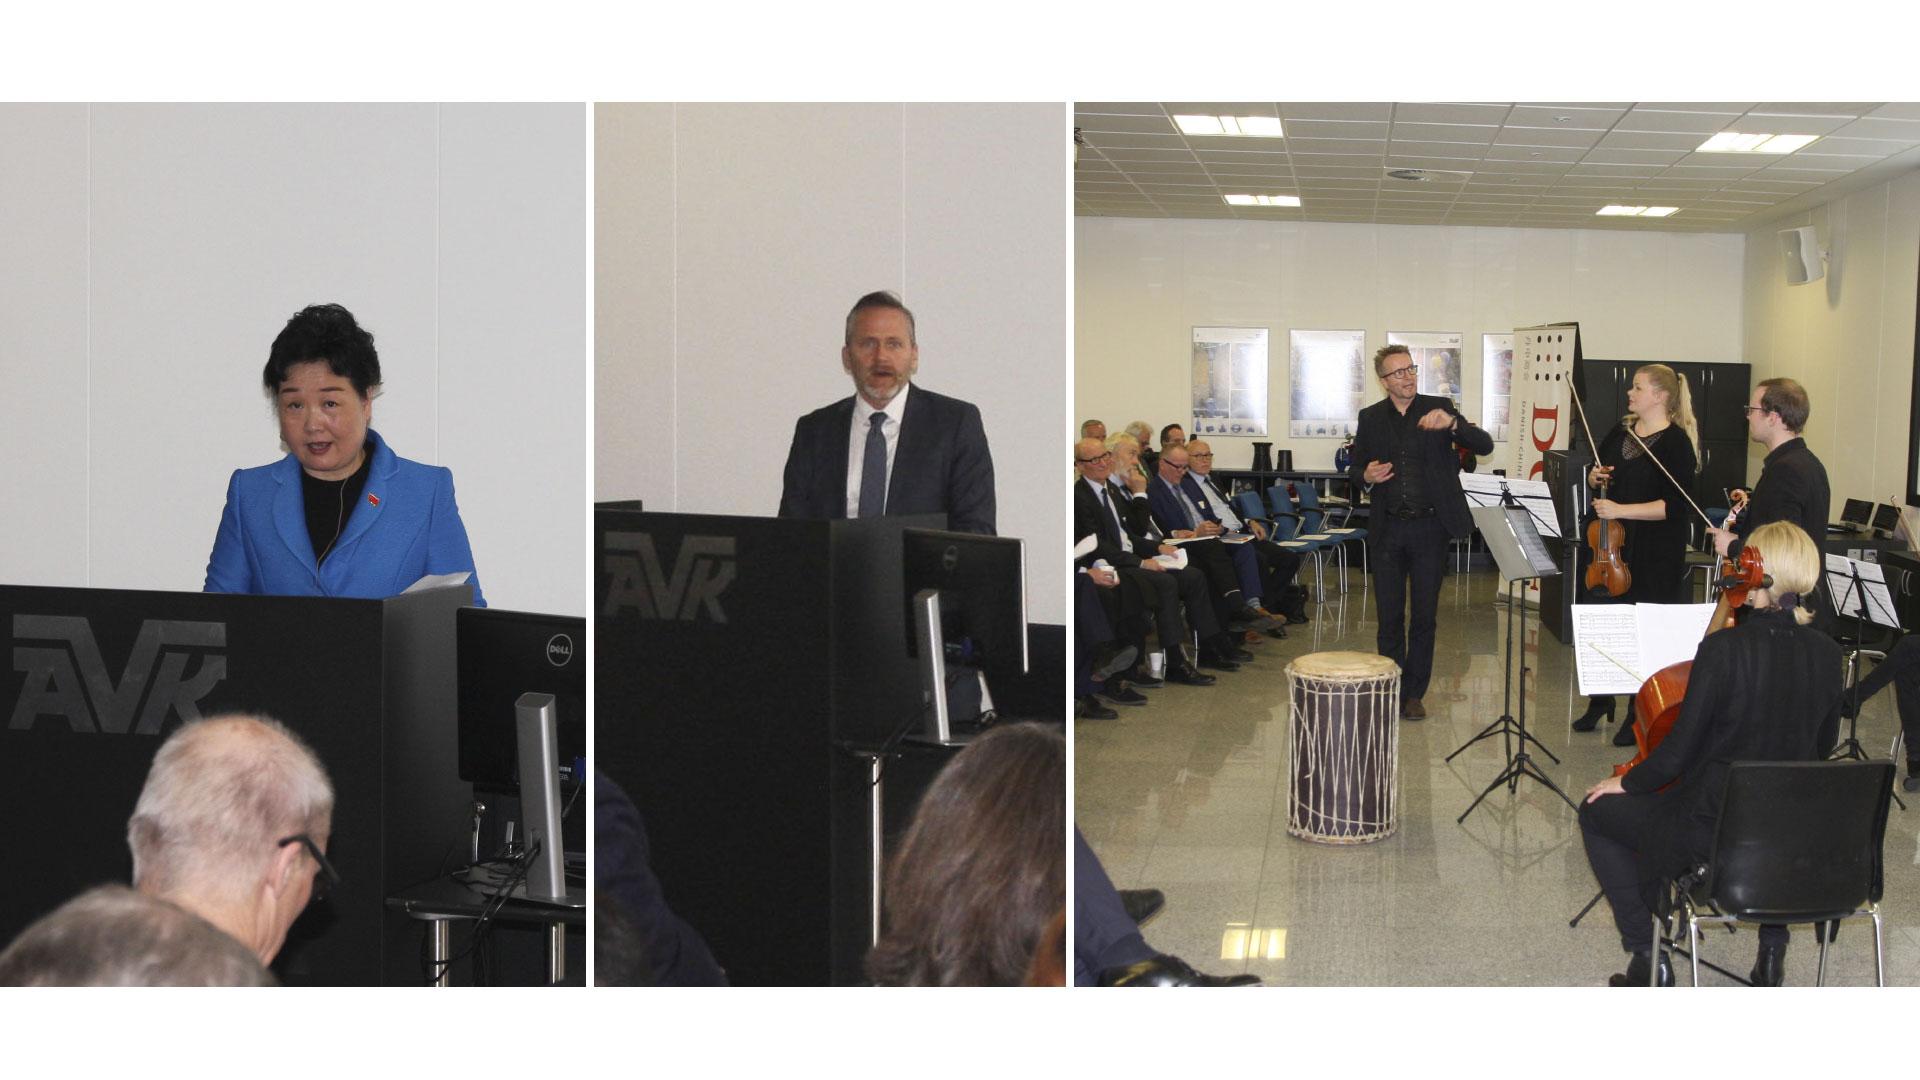 Danish-Chinese Business Forum held at AVK in Denmark